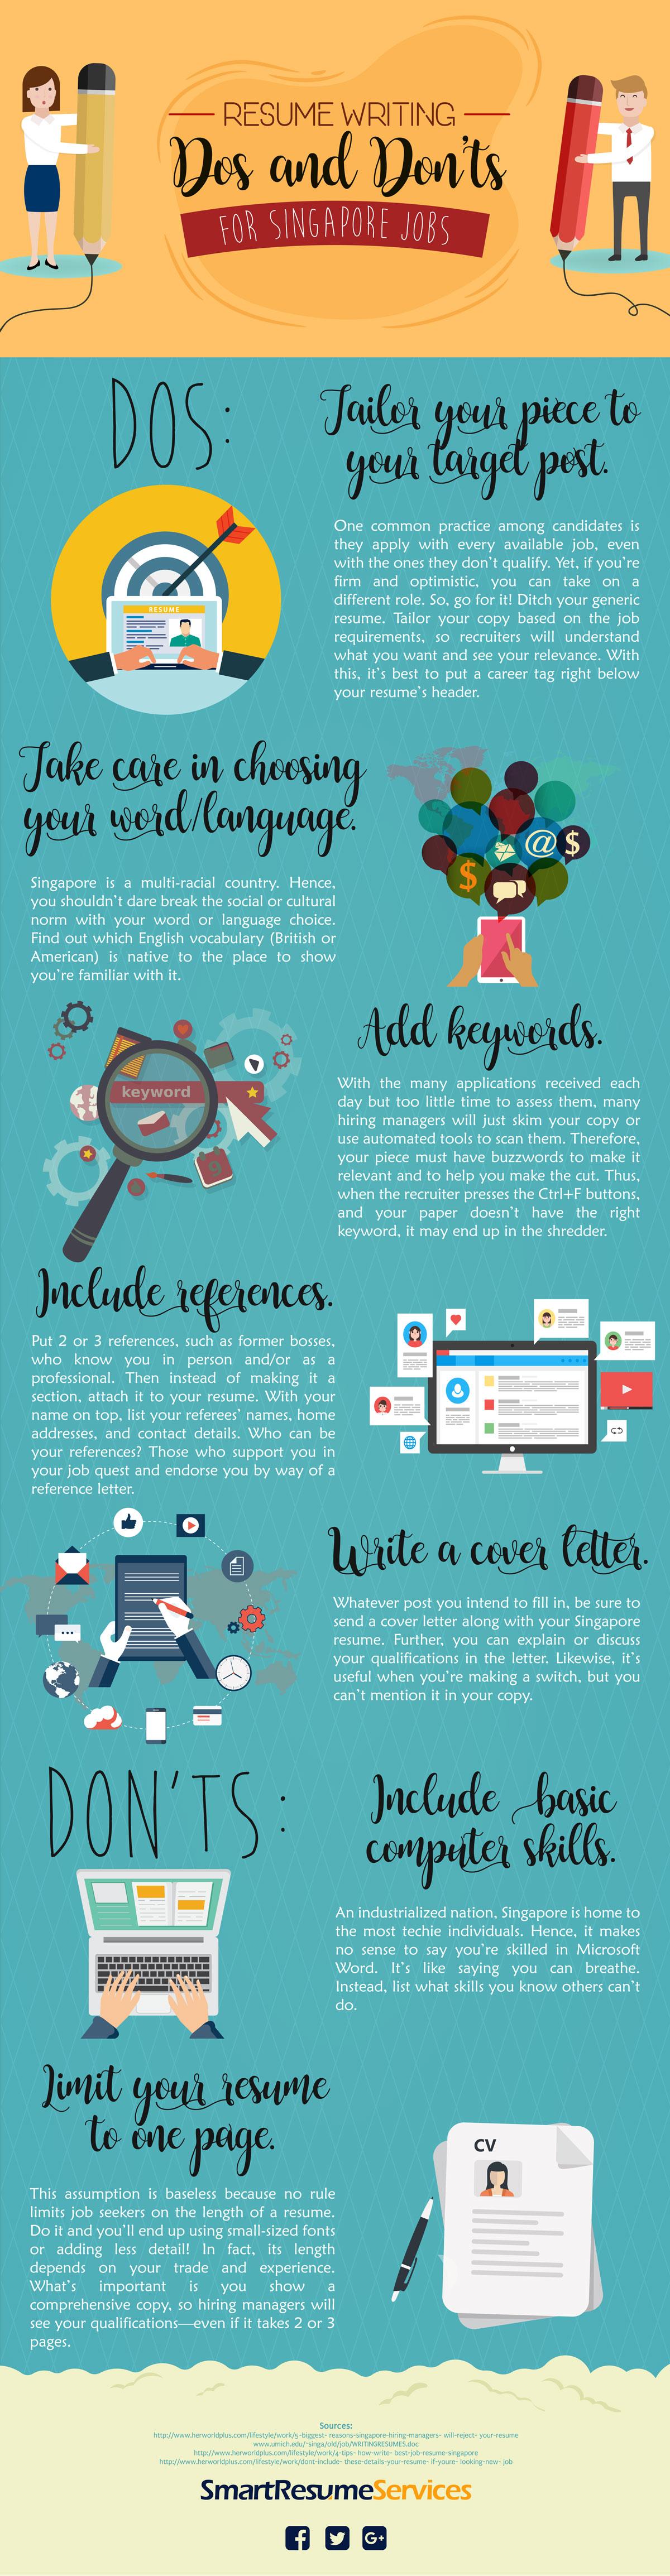 Effective Singaporean resume writing tips